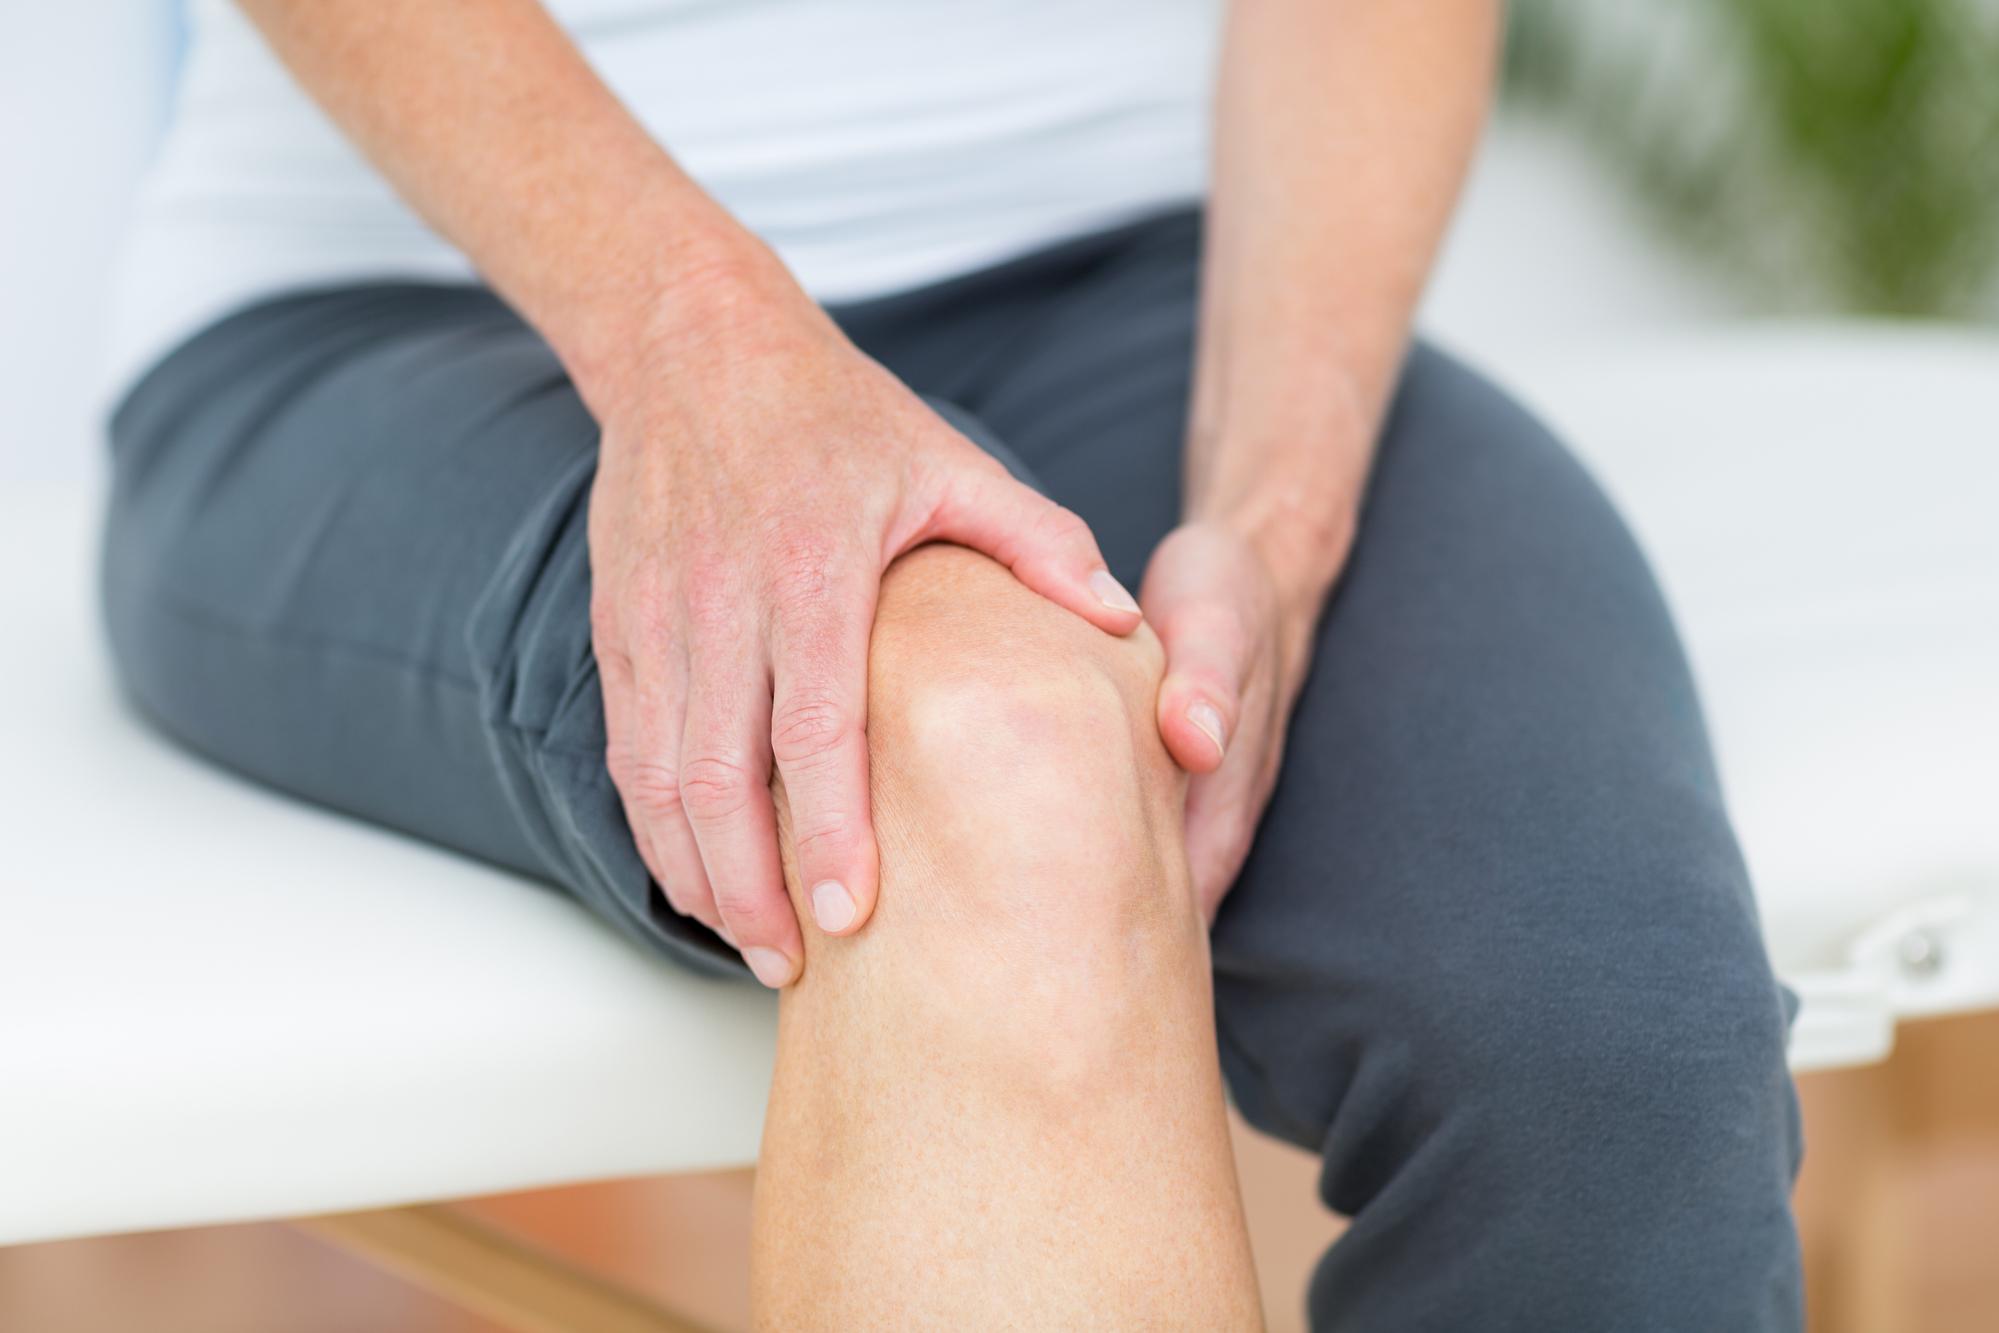 Knee-arthritis-pain-treatment-chronic-knee-pain-chris-homan